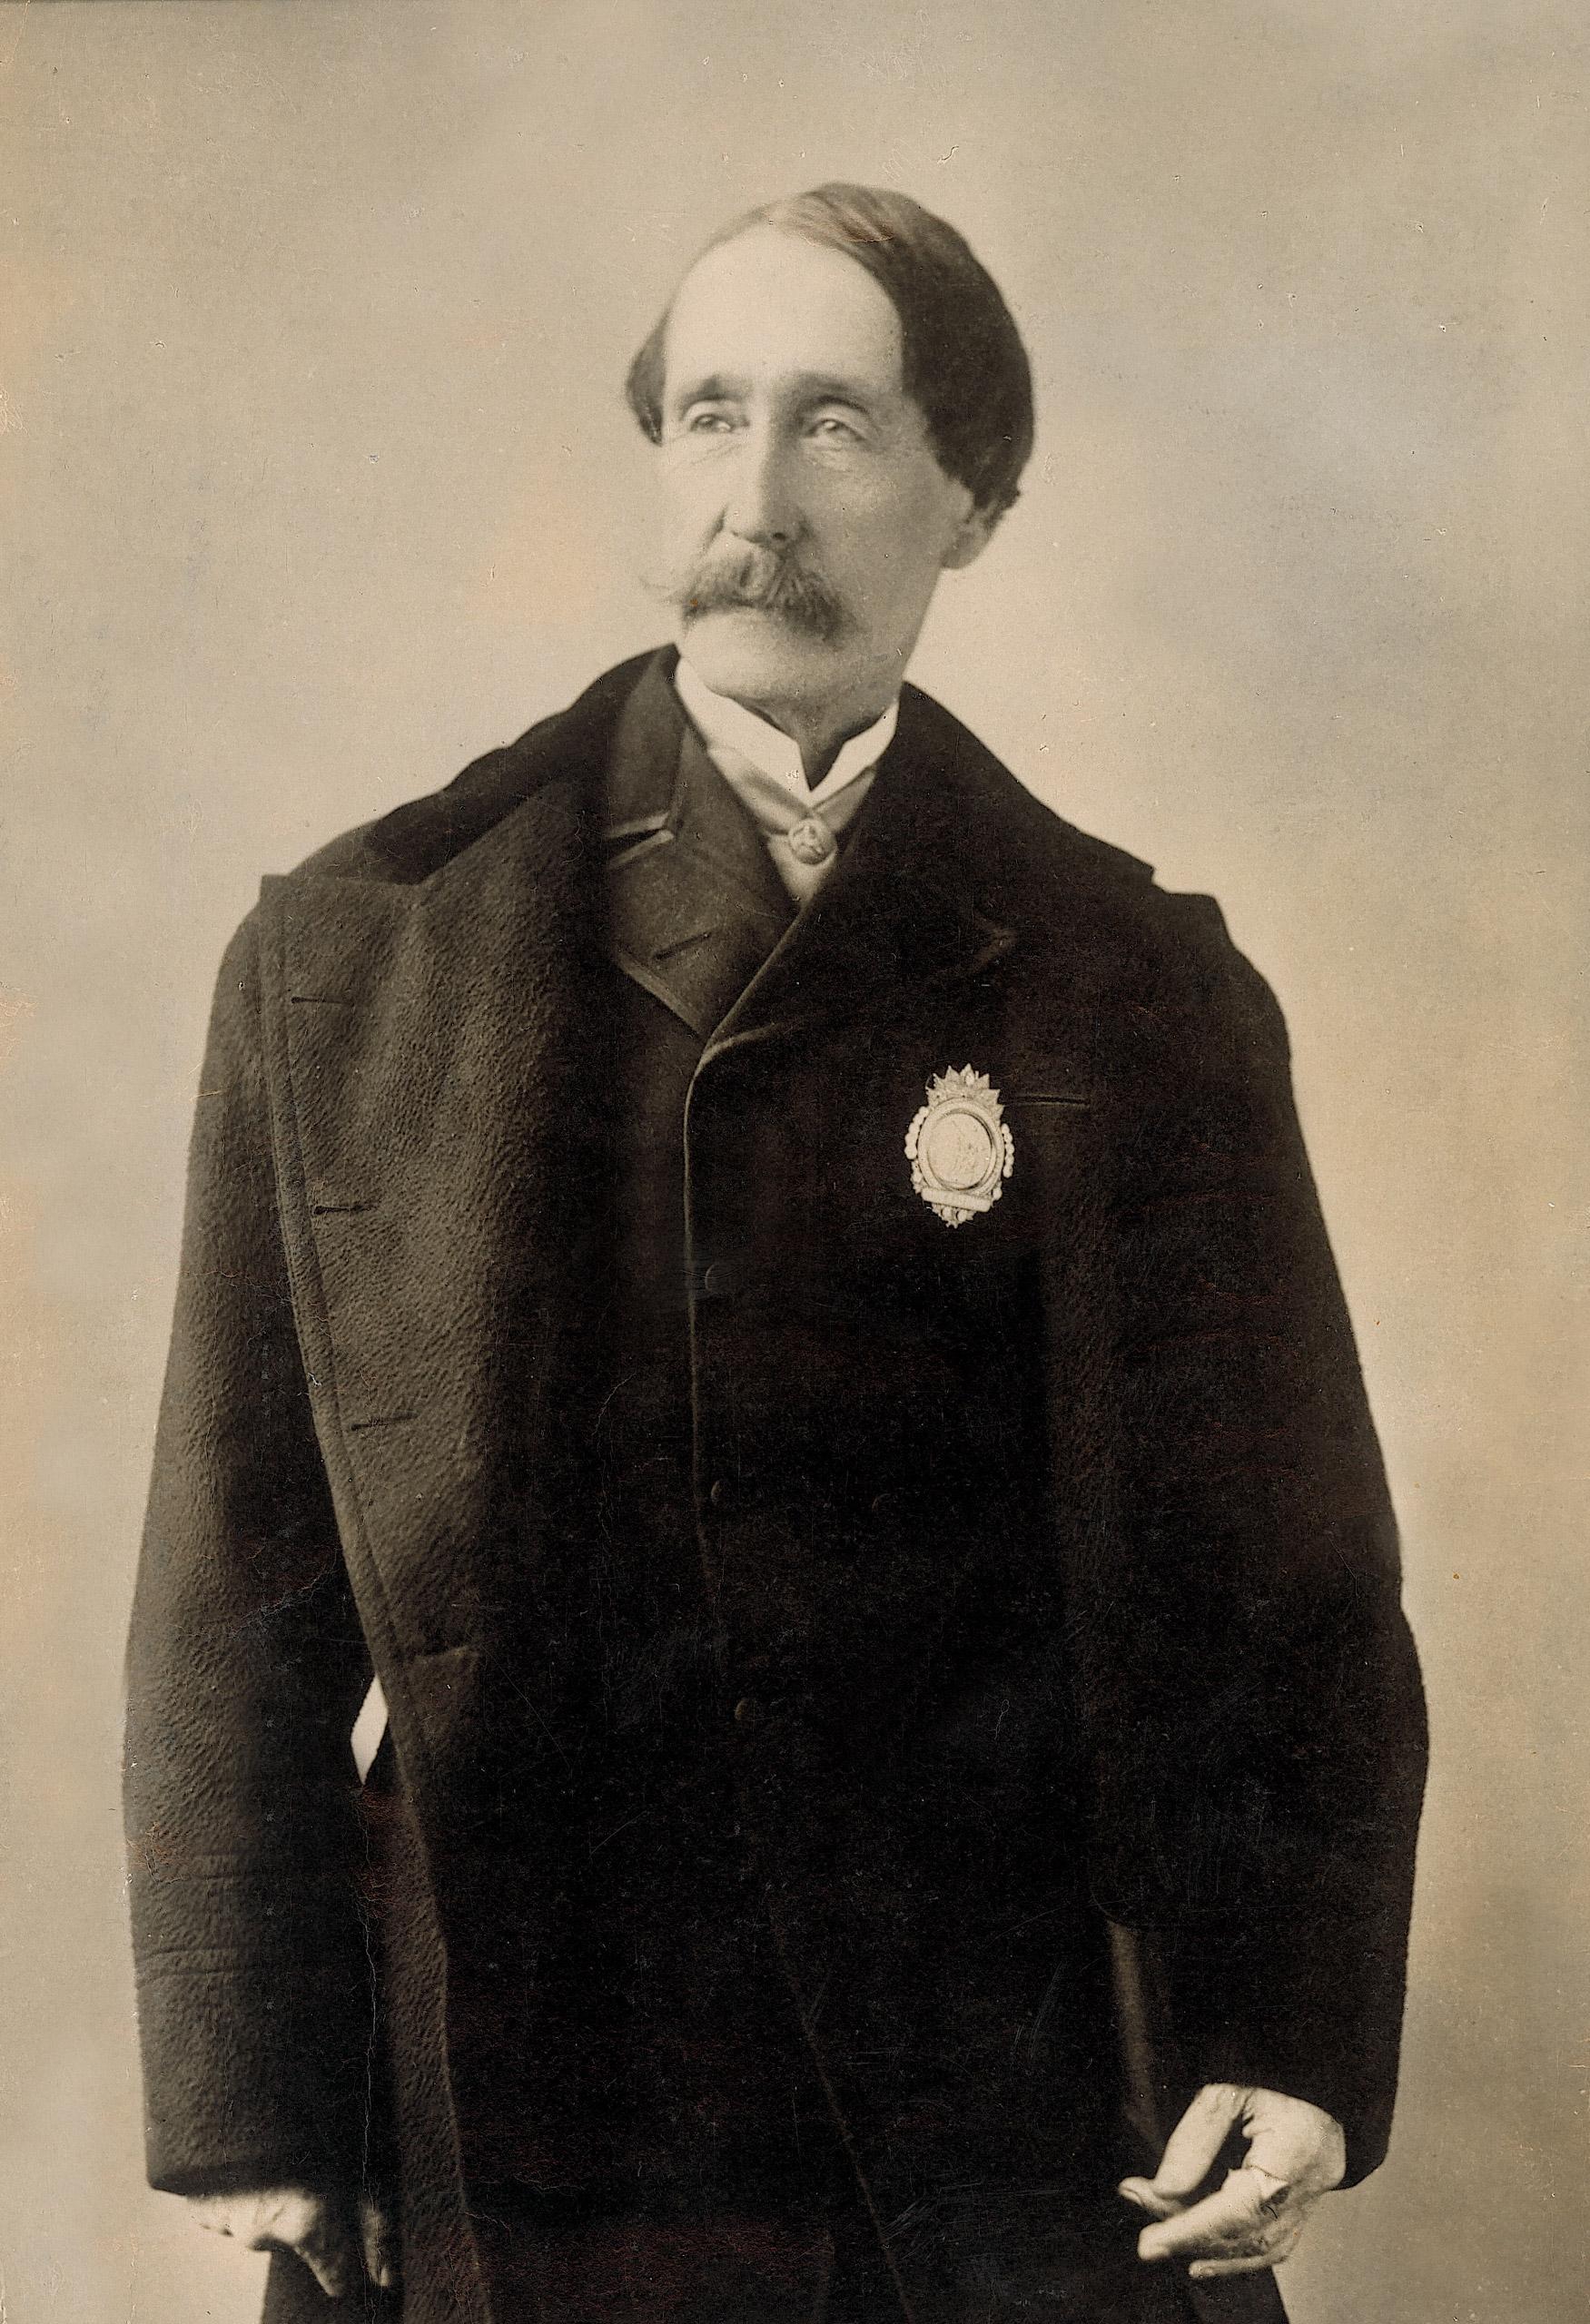 ASPCA founder, Henry Bergh, wearing ASPCA President's badge, 1868.